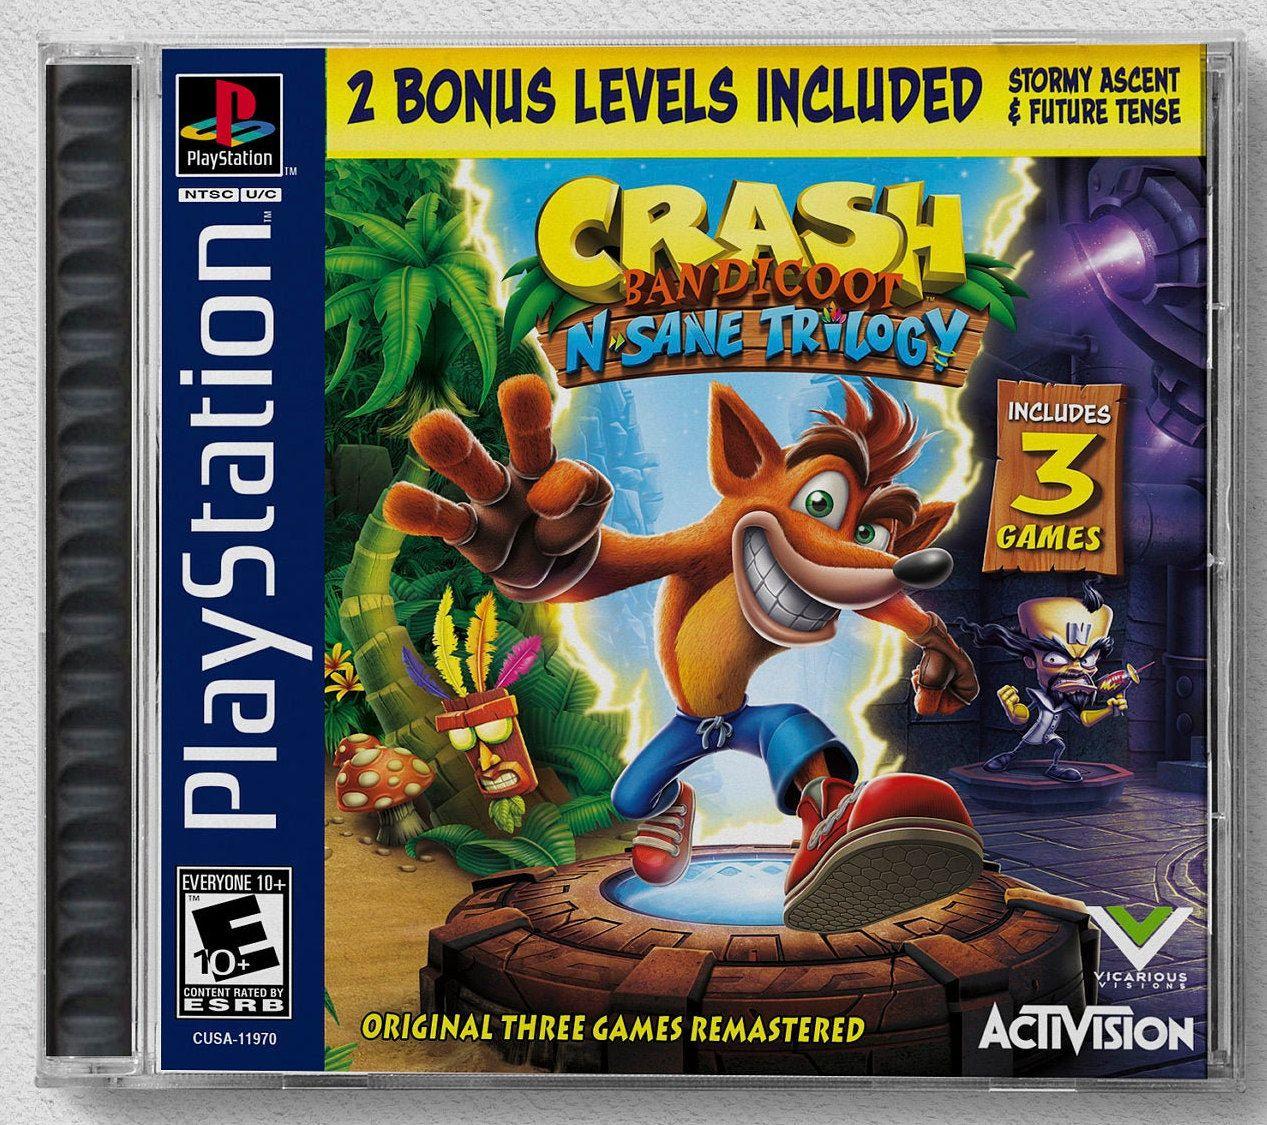 Crash Bandicoot N Sane Trilogy Ps4 Custom Ps1 Inspired Etsy Bandicoot Crash Bandicoot Trilogy